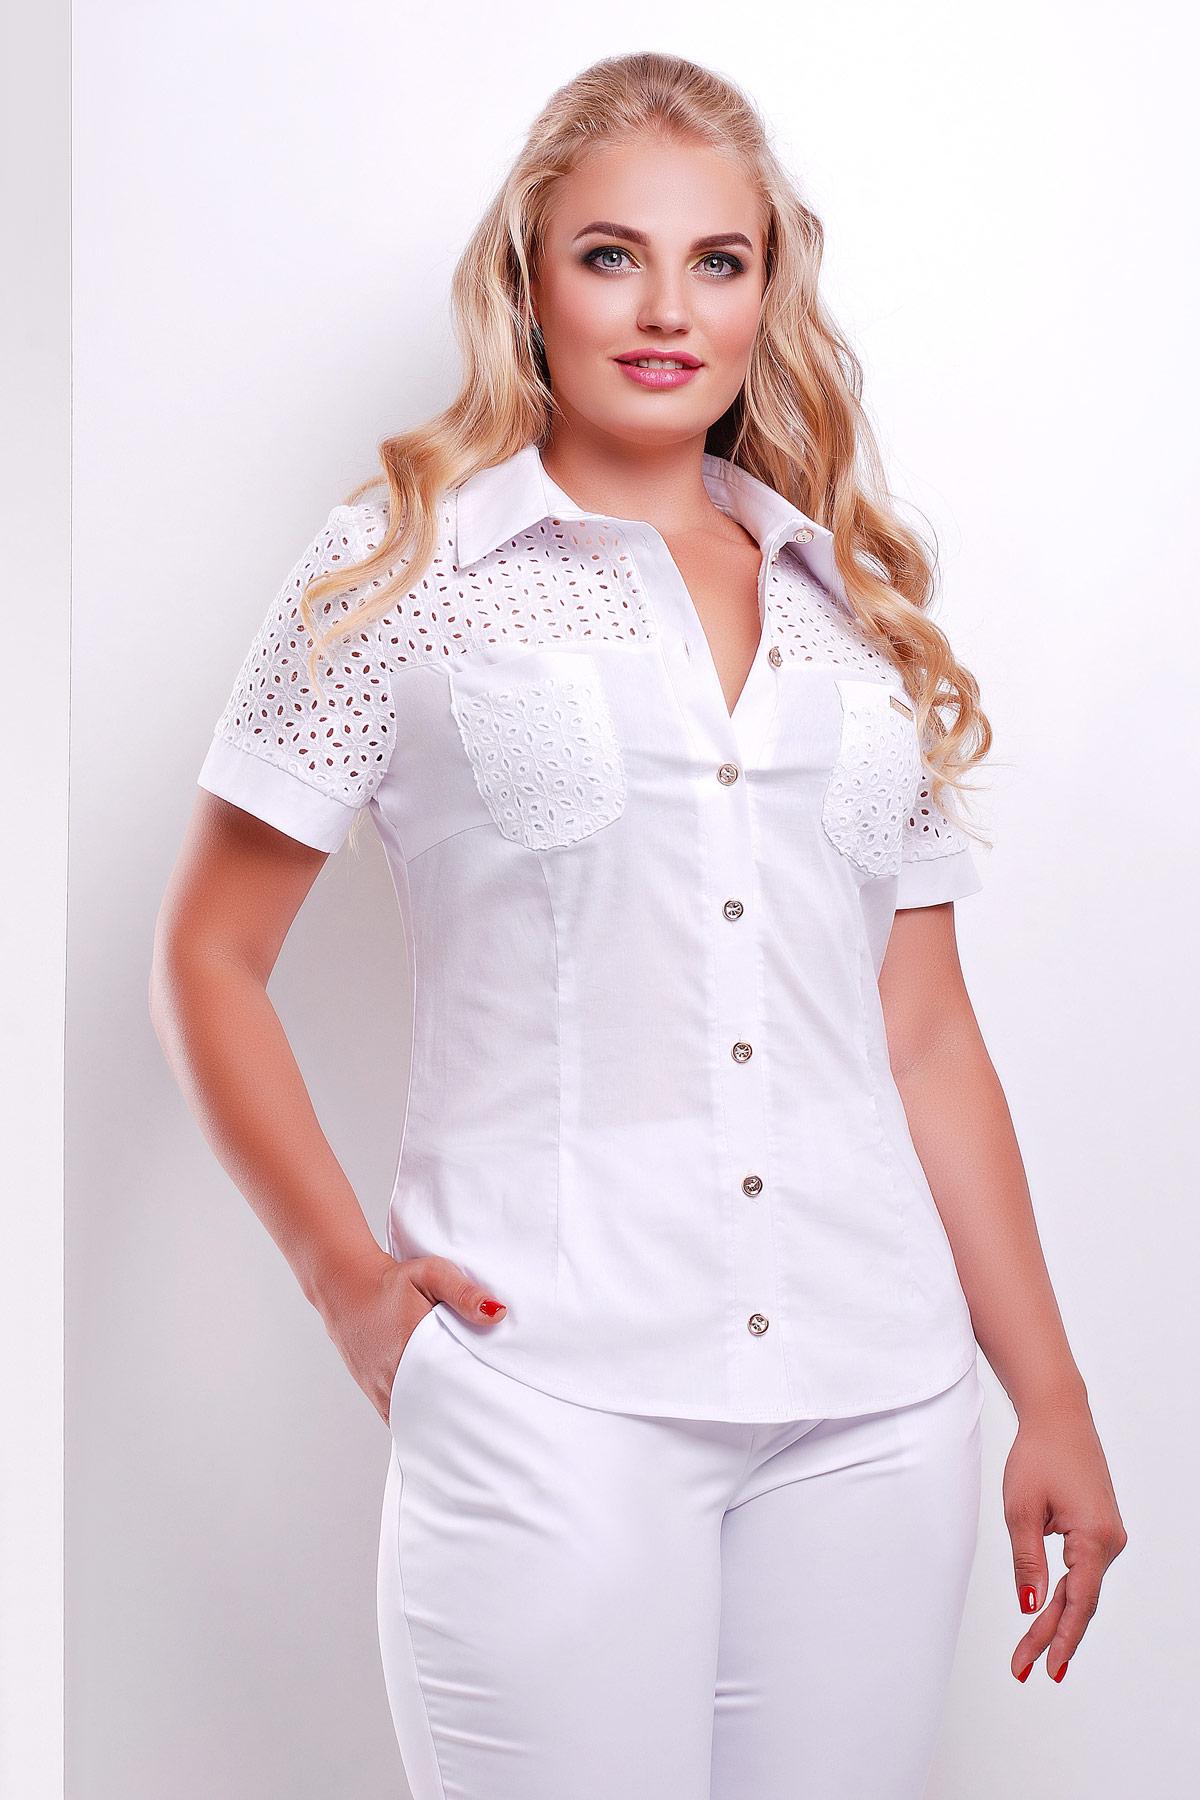 0ffca5b41a7 женская блузка белая большого размера. блуза Фауста-Б к р. Цвет